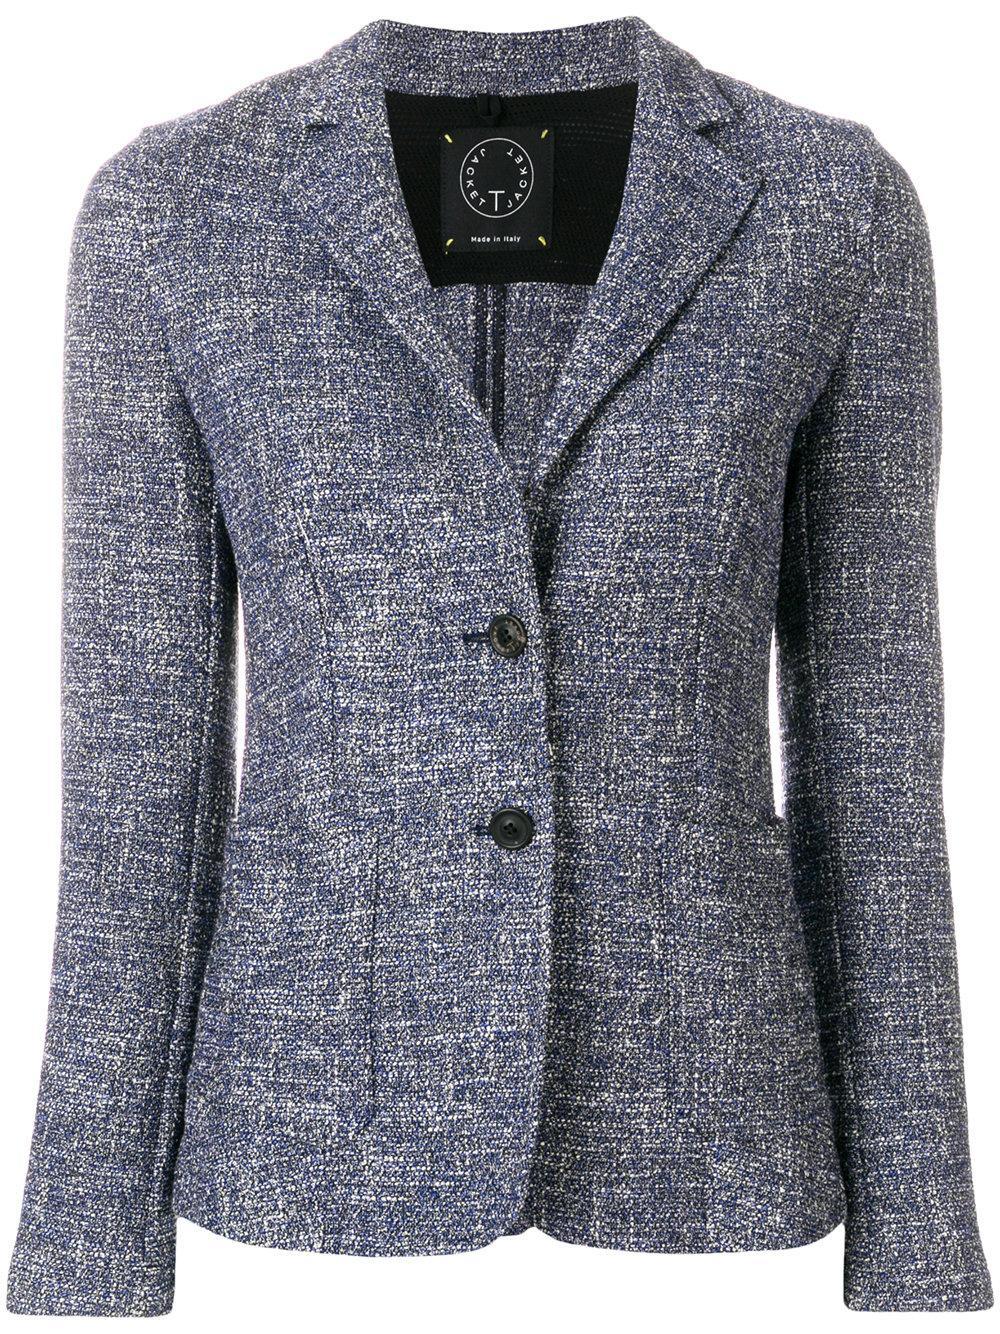 T-jacket Blue